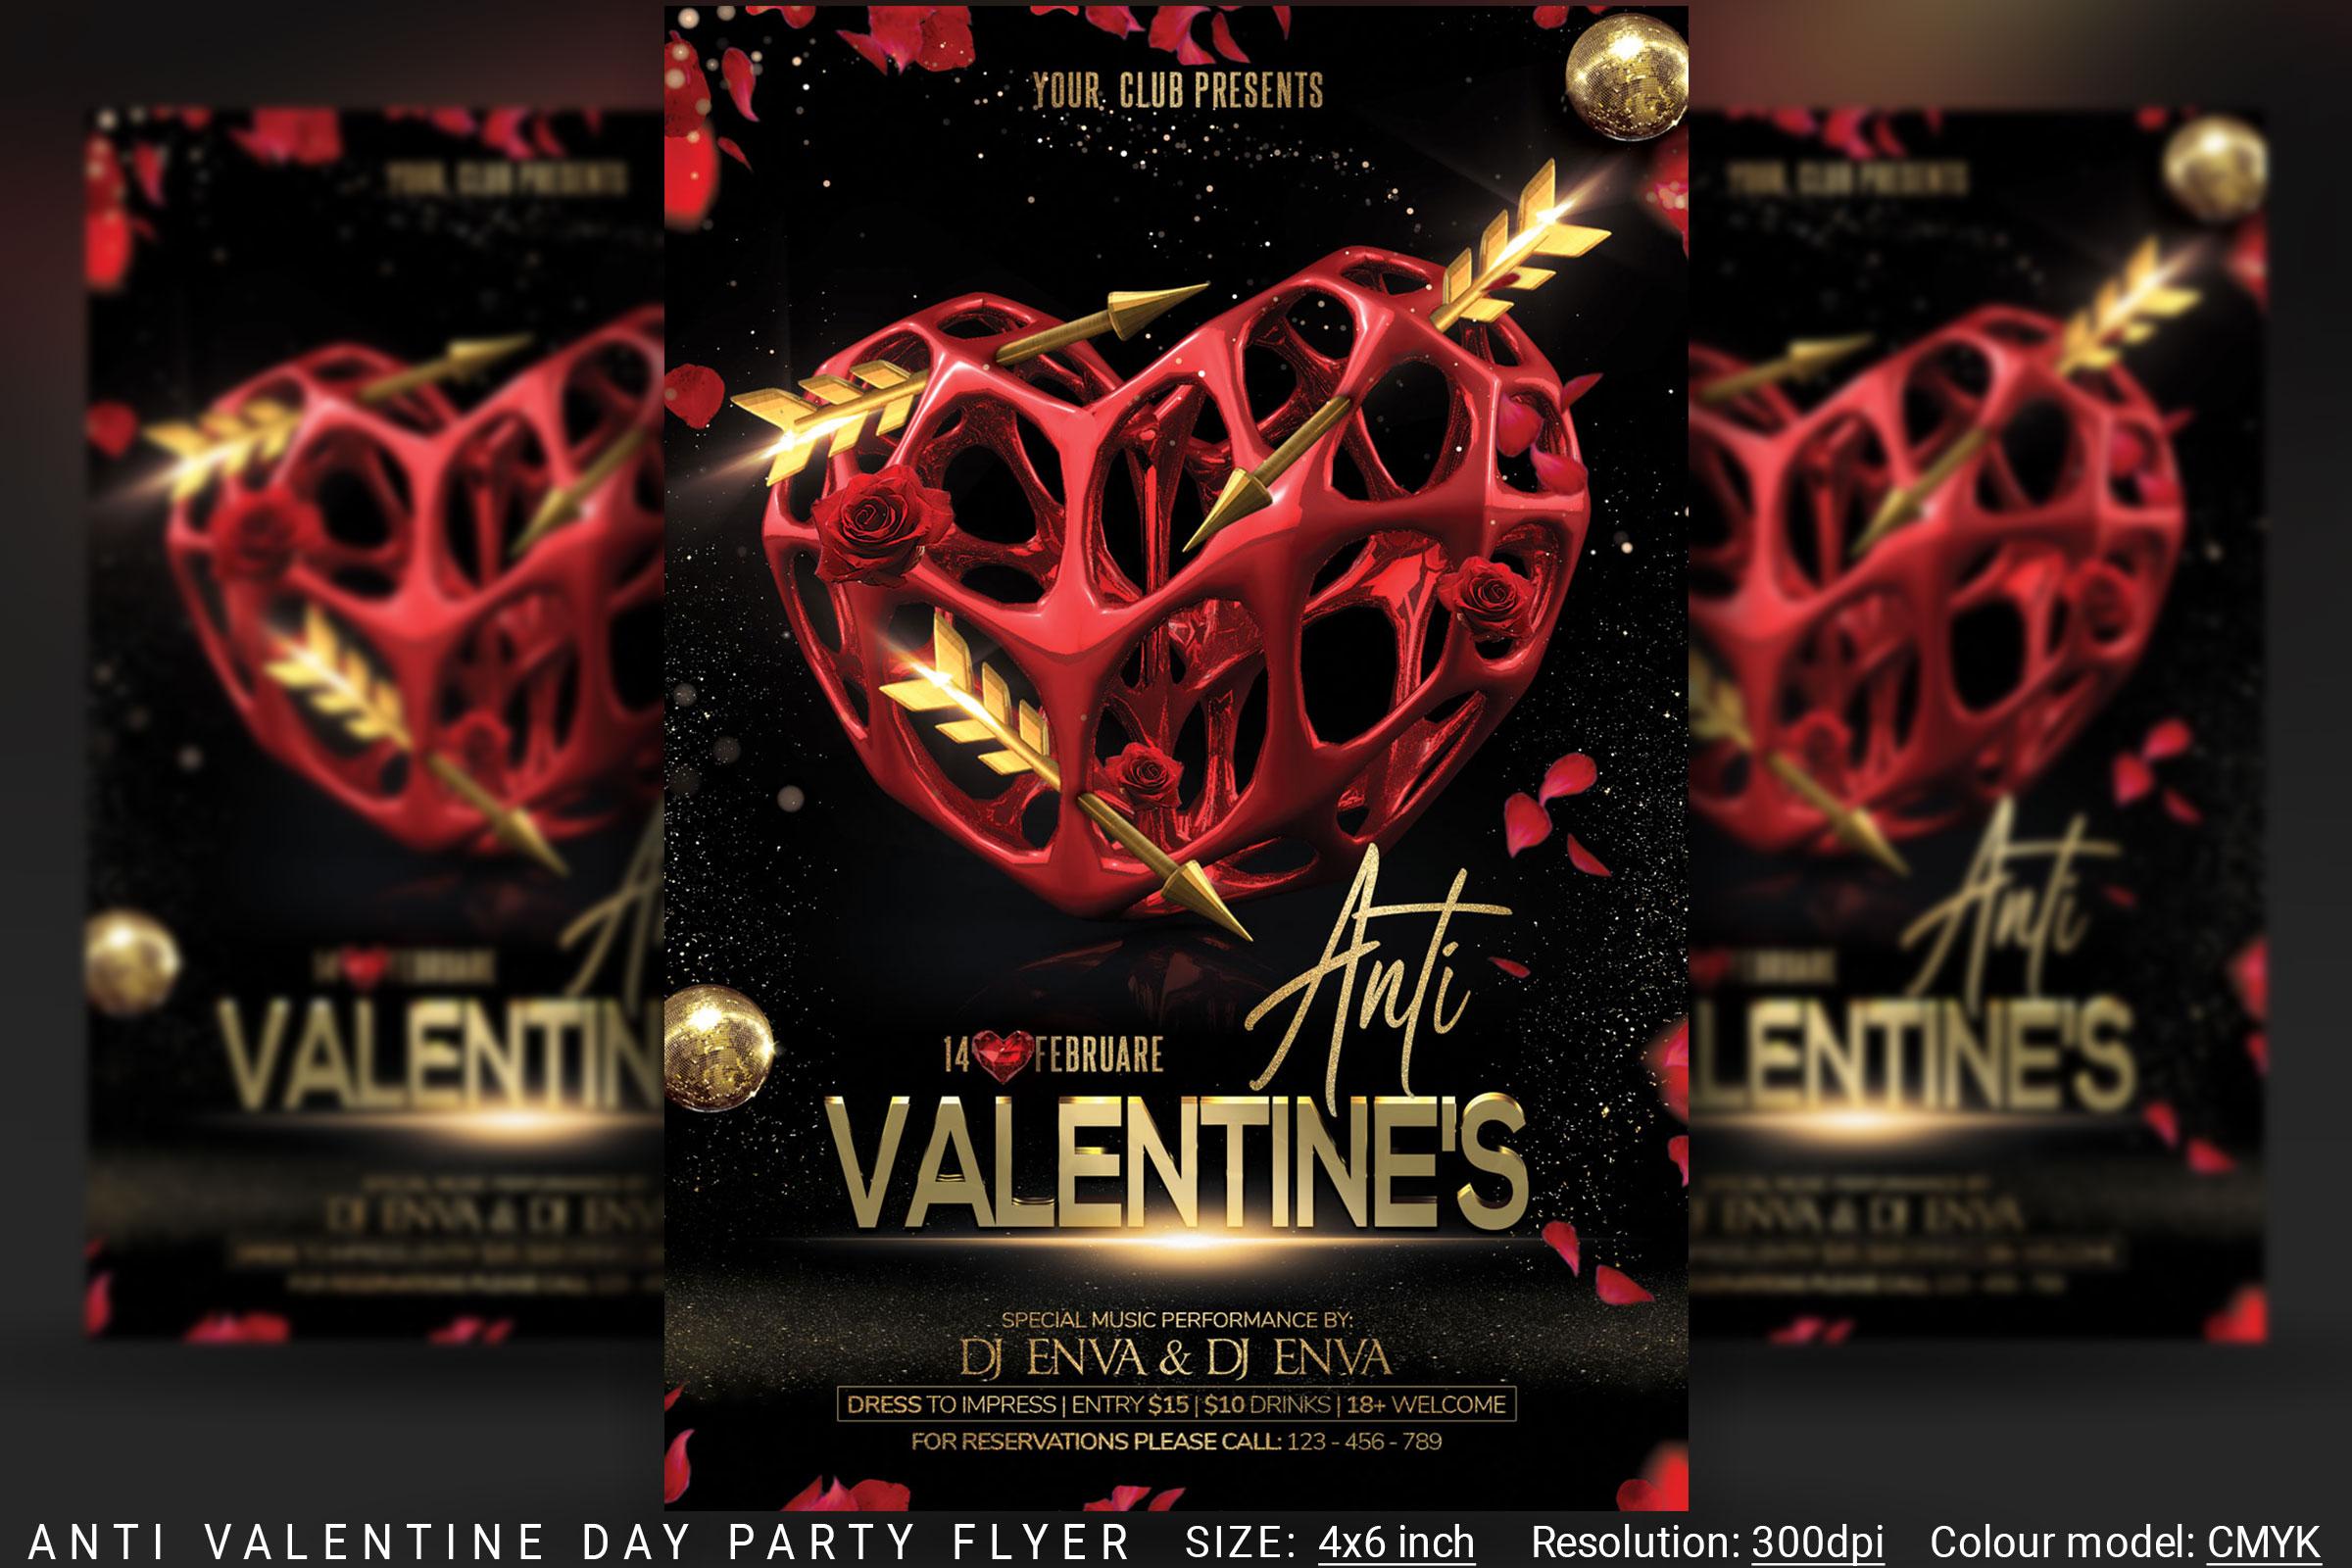 Anti Valentine Day Flyer example image 1